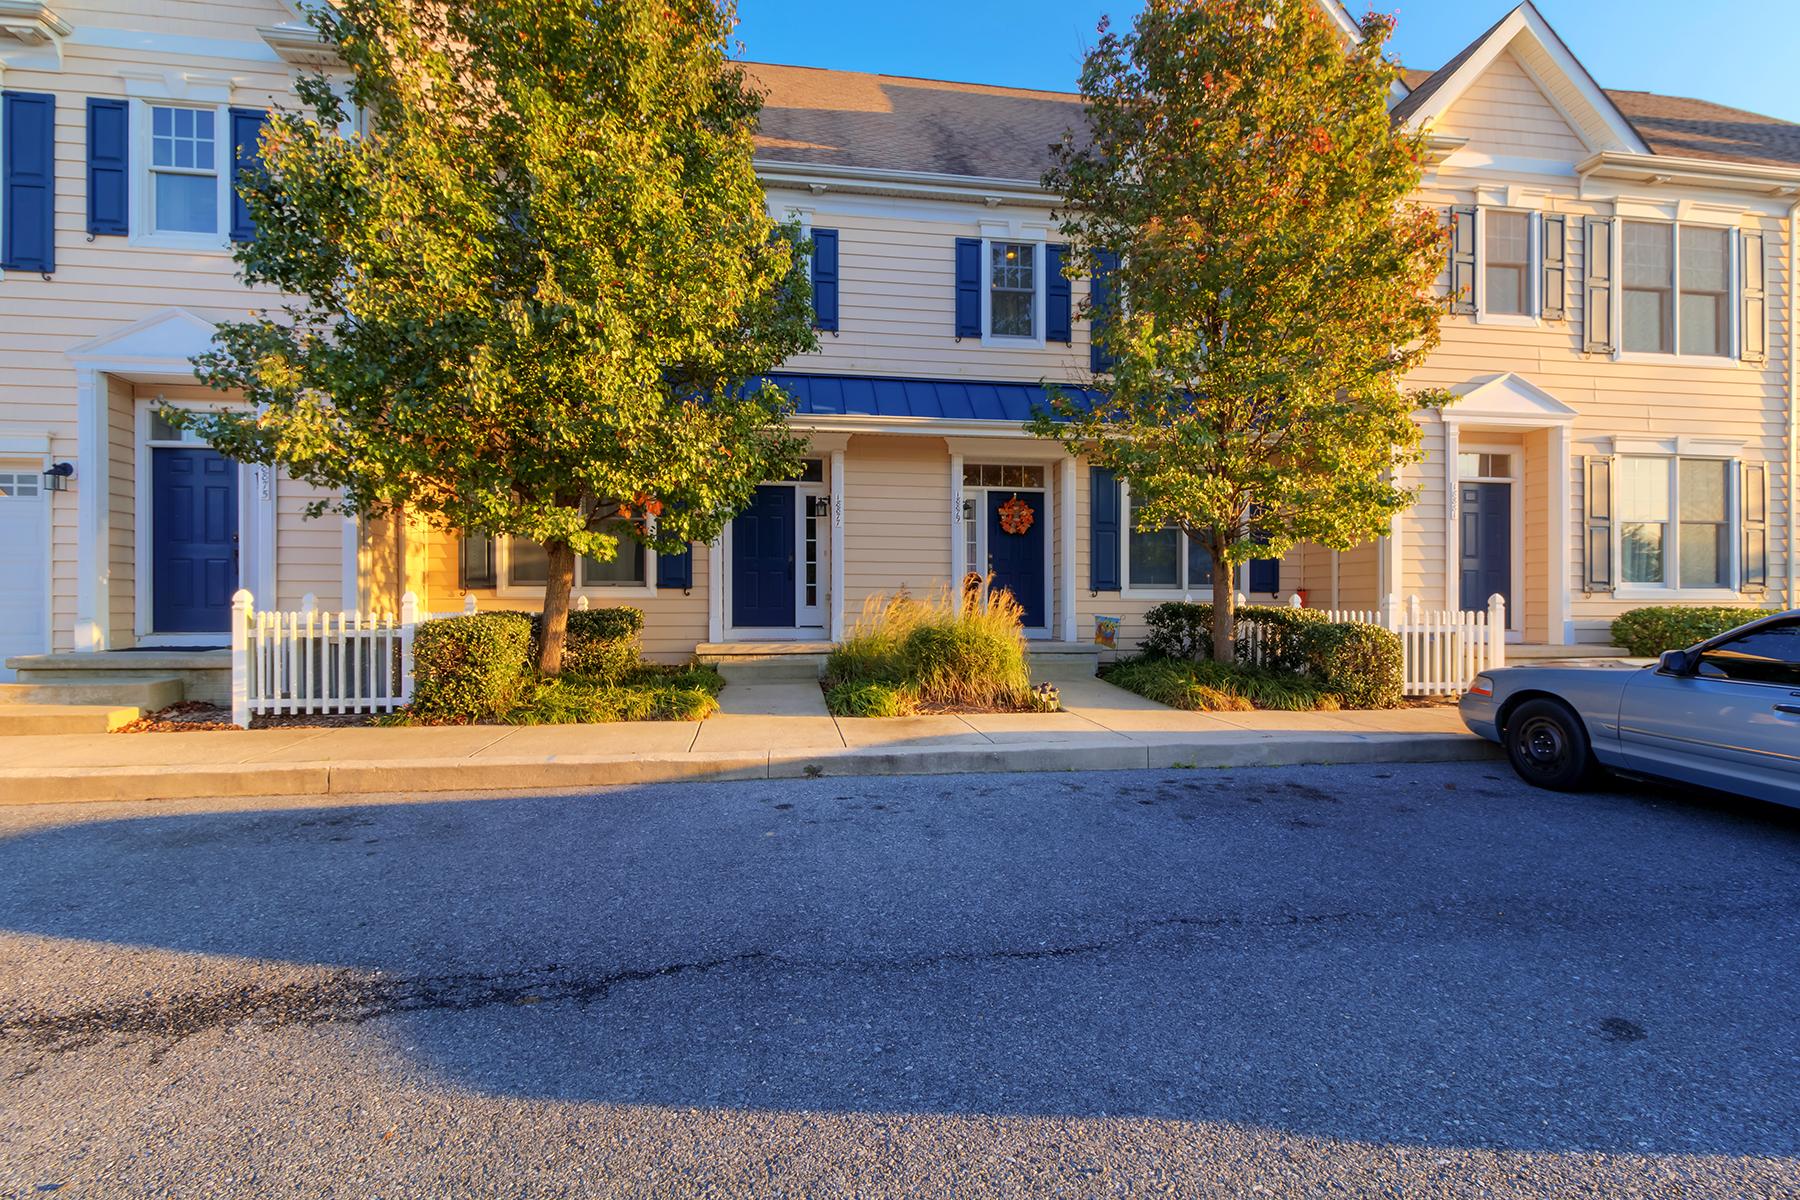 Nhà chung cư vì Bán tại 18879 Bethpage Dr , Lewes, DE 19958 18879 Bethpage Dr 5D, Lewes, Delaware, 19958 Hoa Kỳ